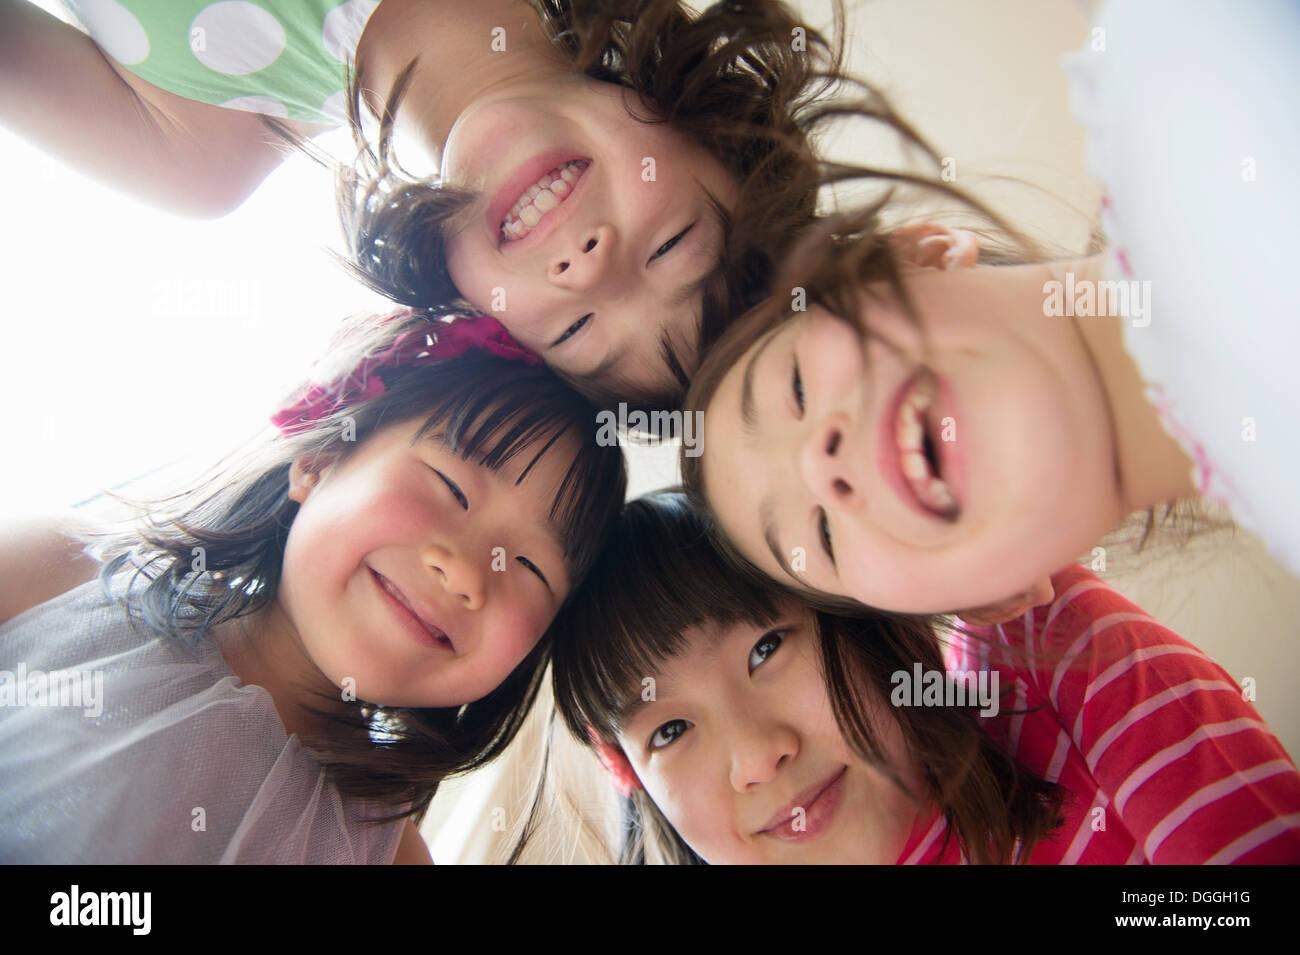 Girls in huddle looking at camera, smiling - Stock Image